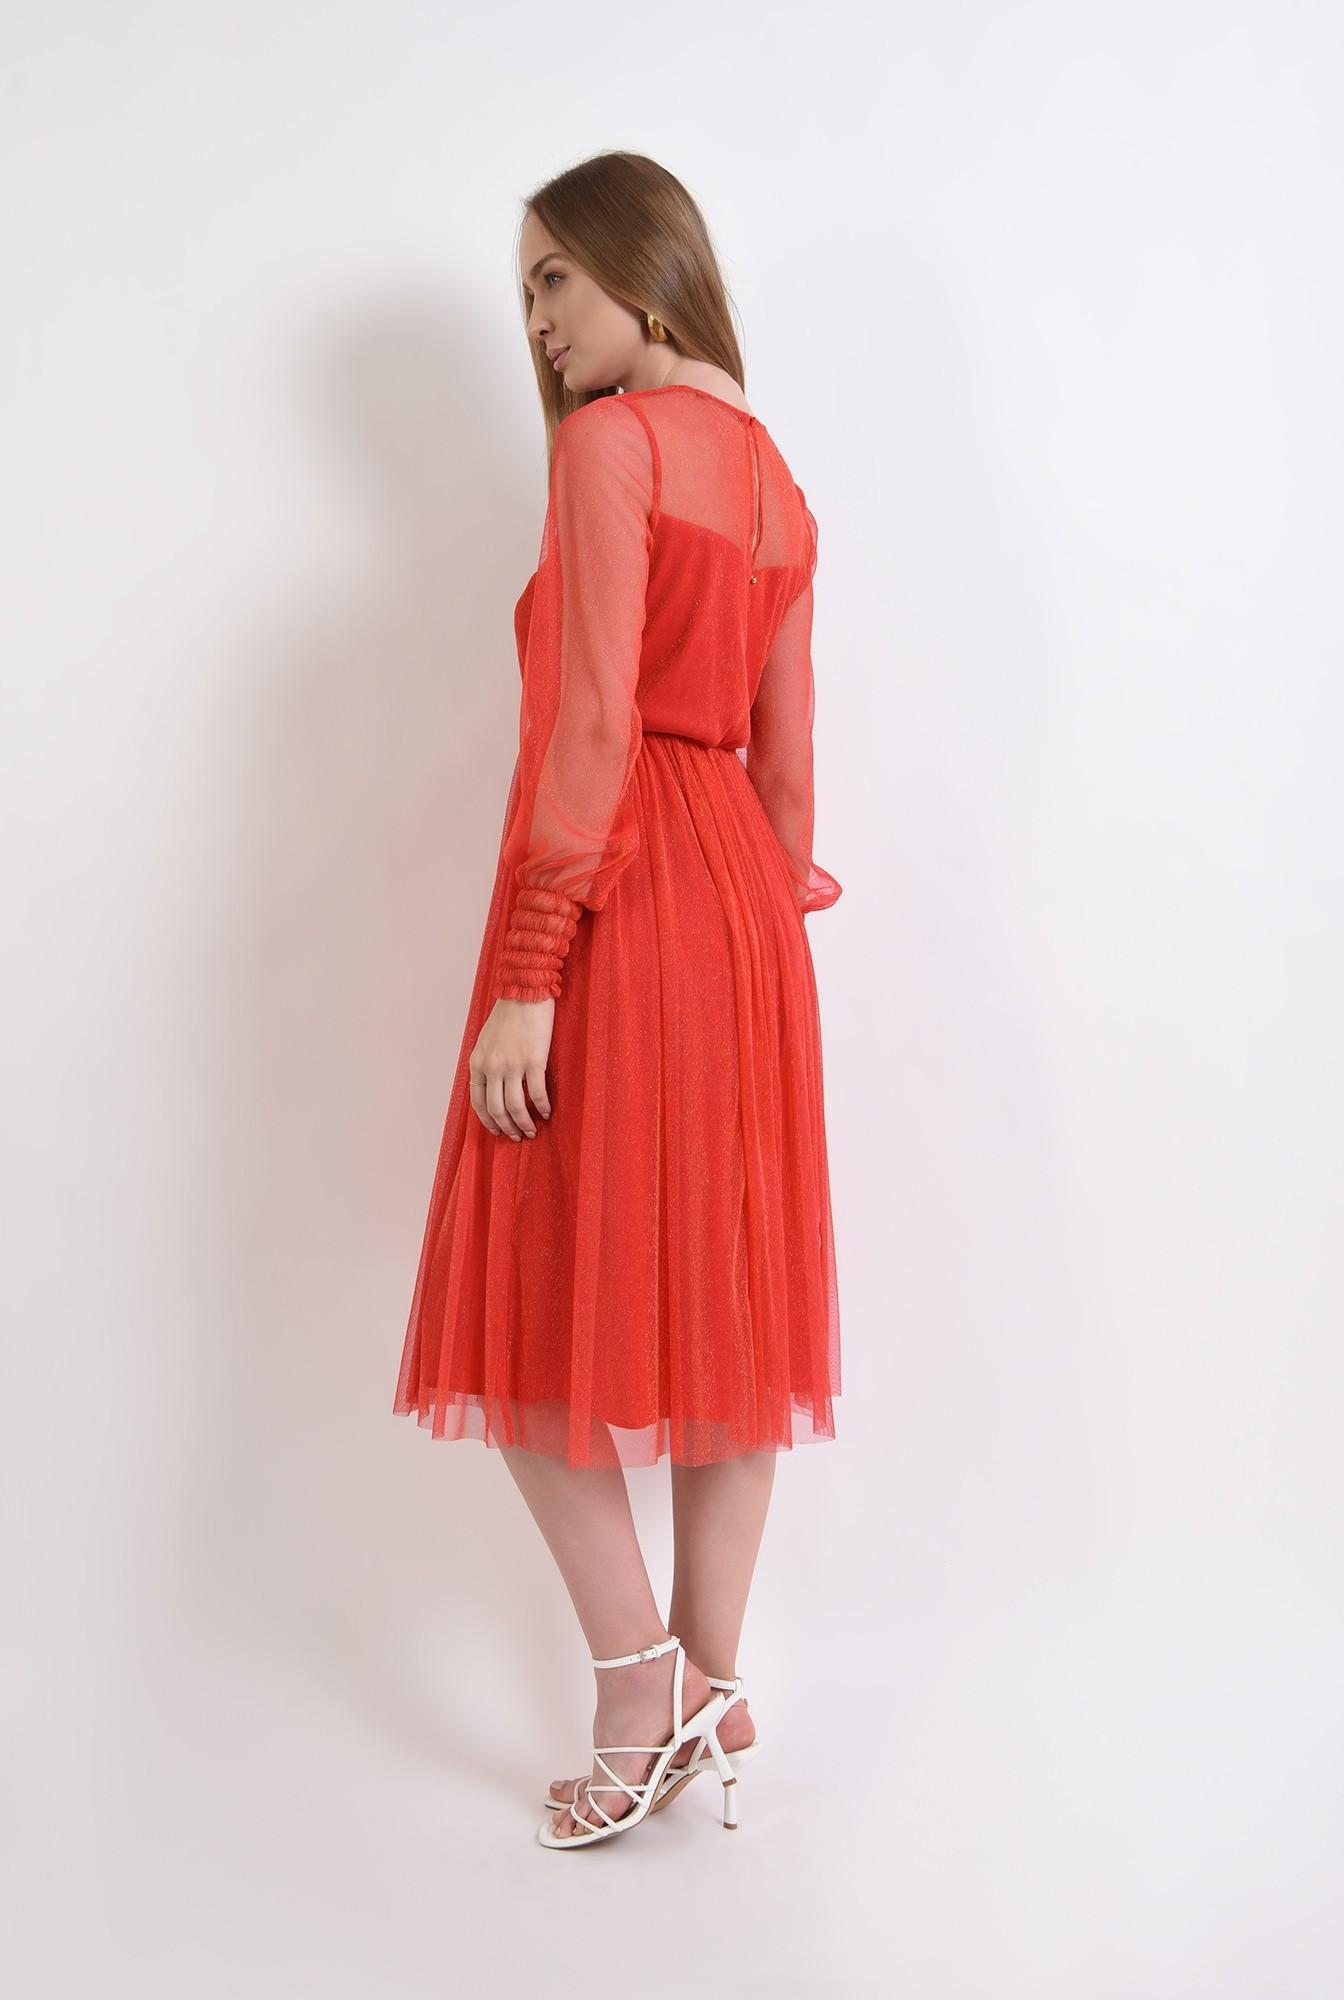 1 - rochie eleganta, din tul, maneci cu manseta, decolteu aparent